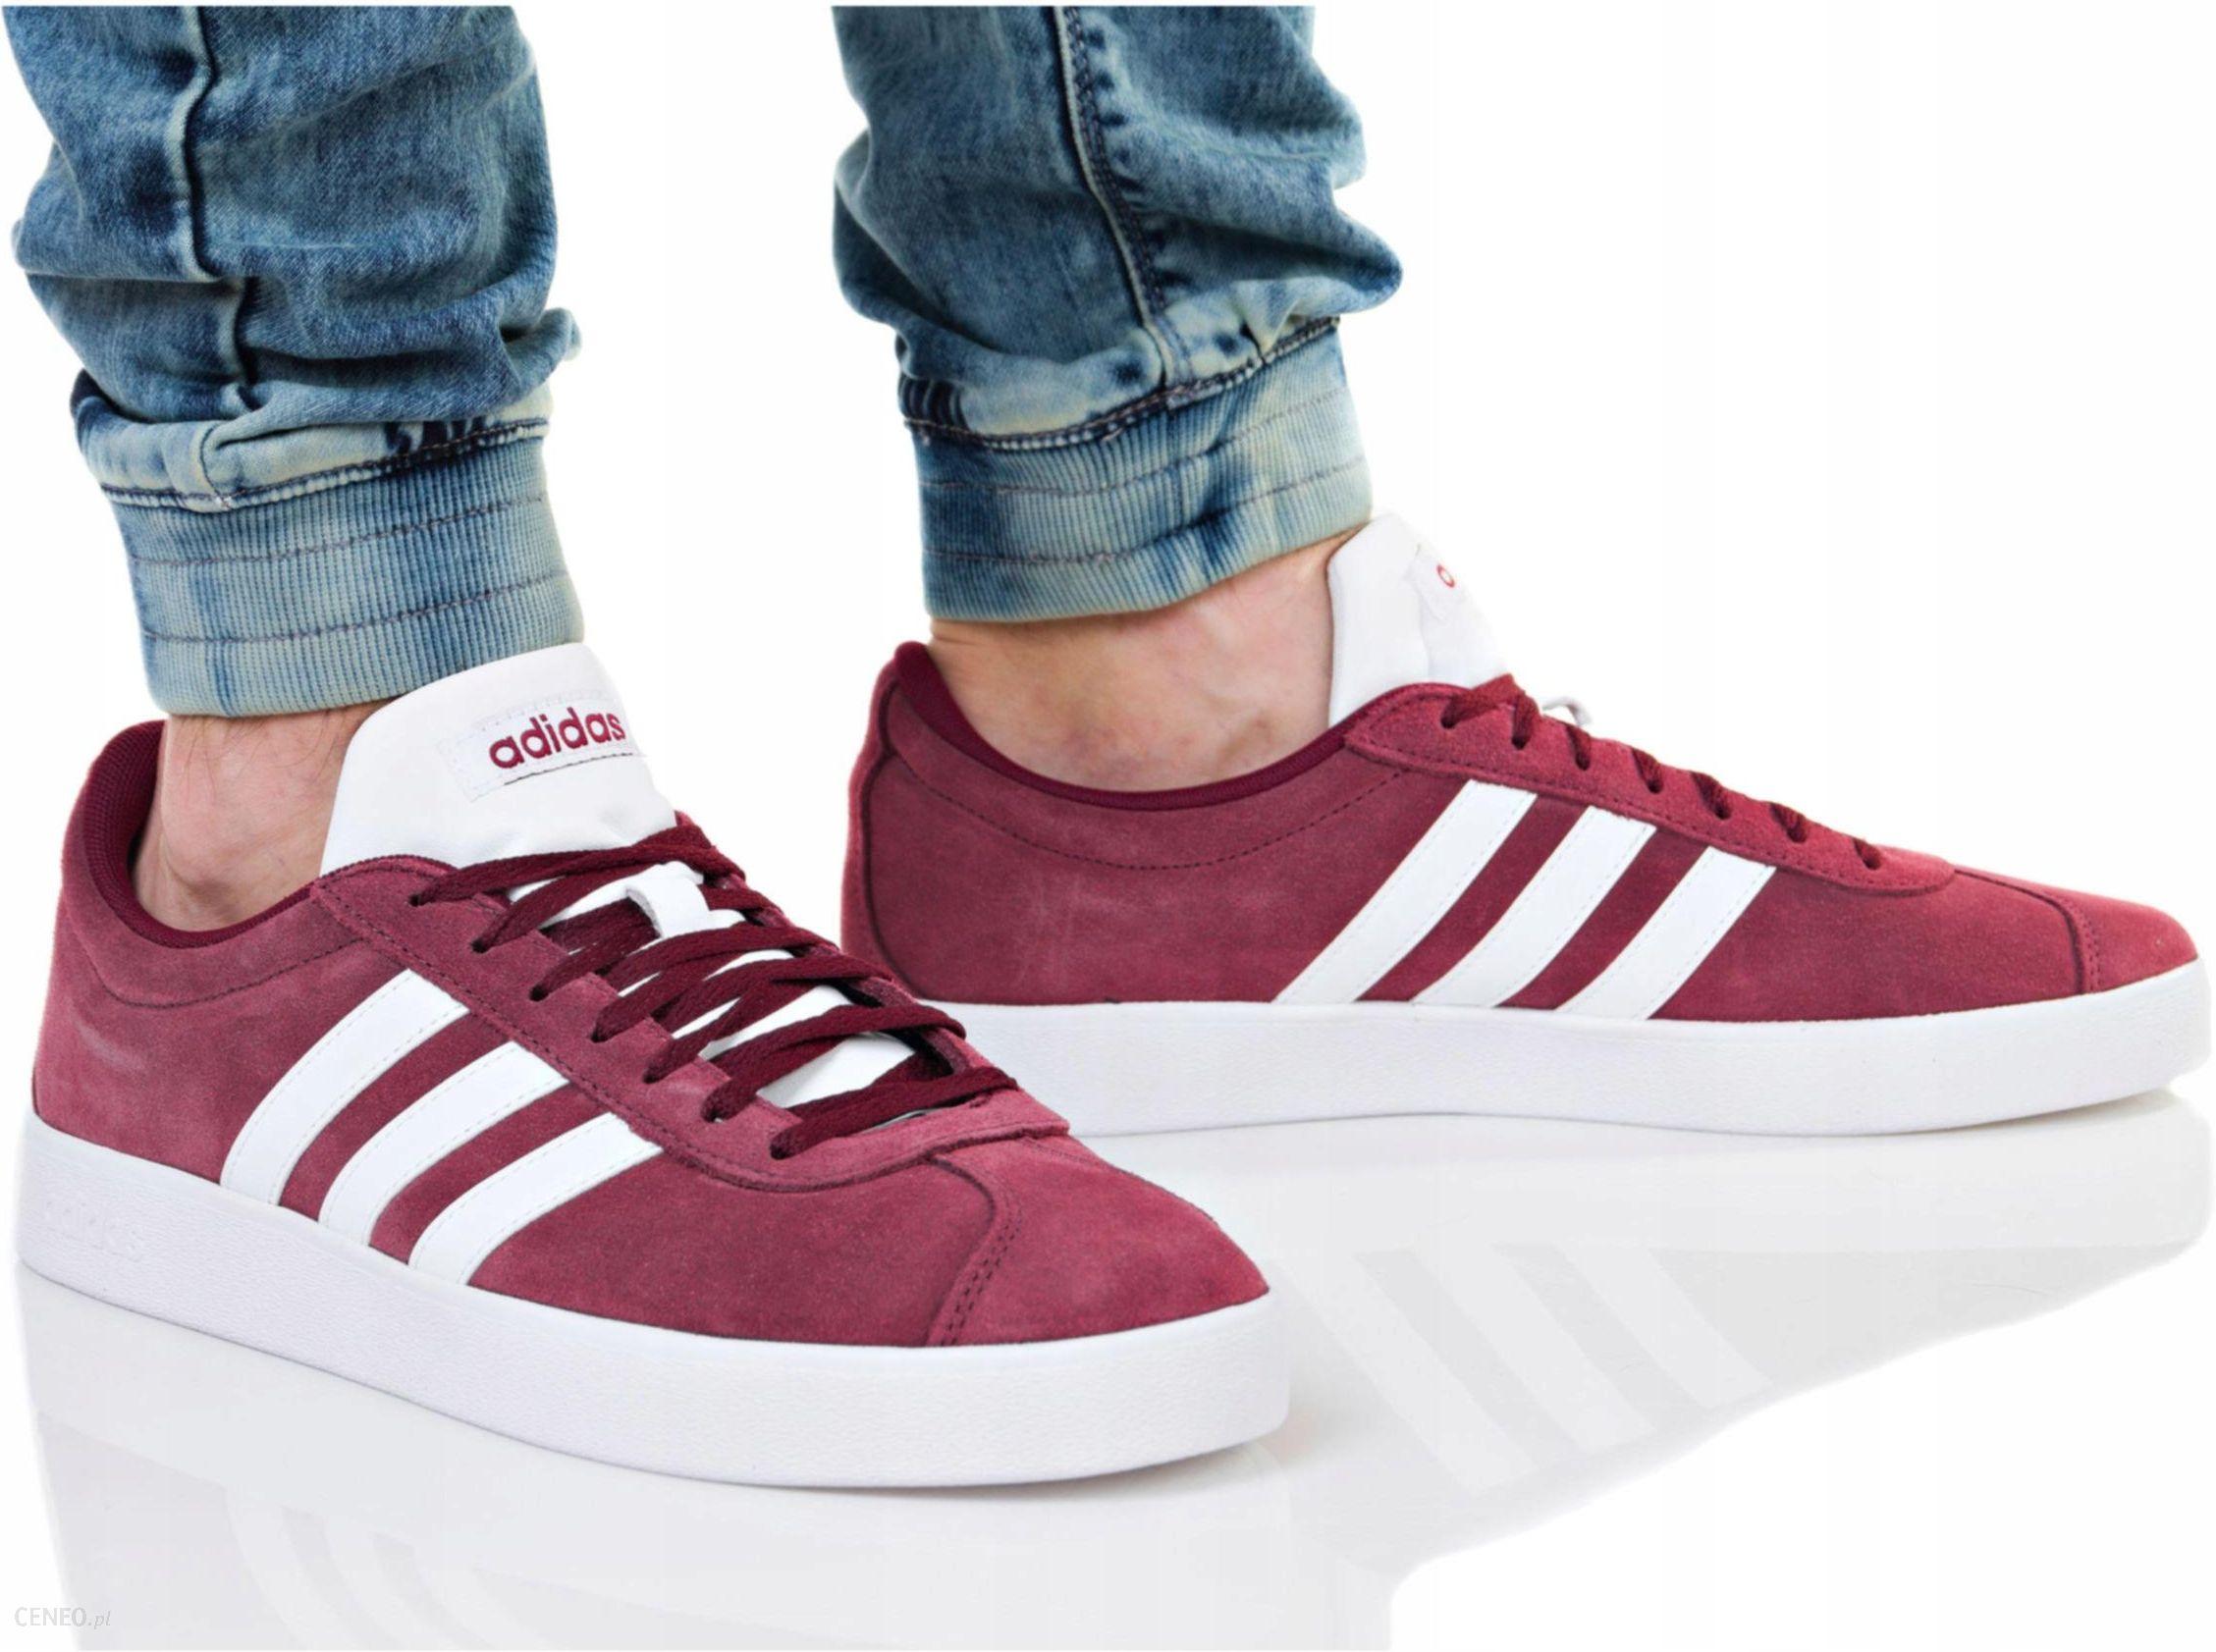 4469984af265d1 Buty Adidas VL Court 2.0 DA9855 Bordowe R. 46 - Ceny i opinie - Ceneo.pl